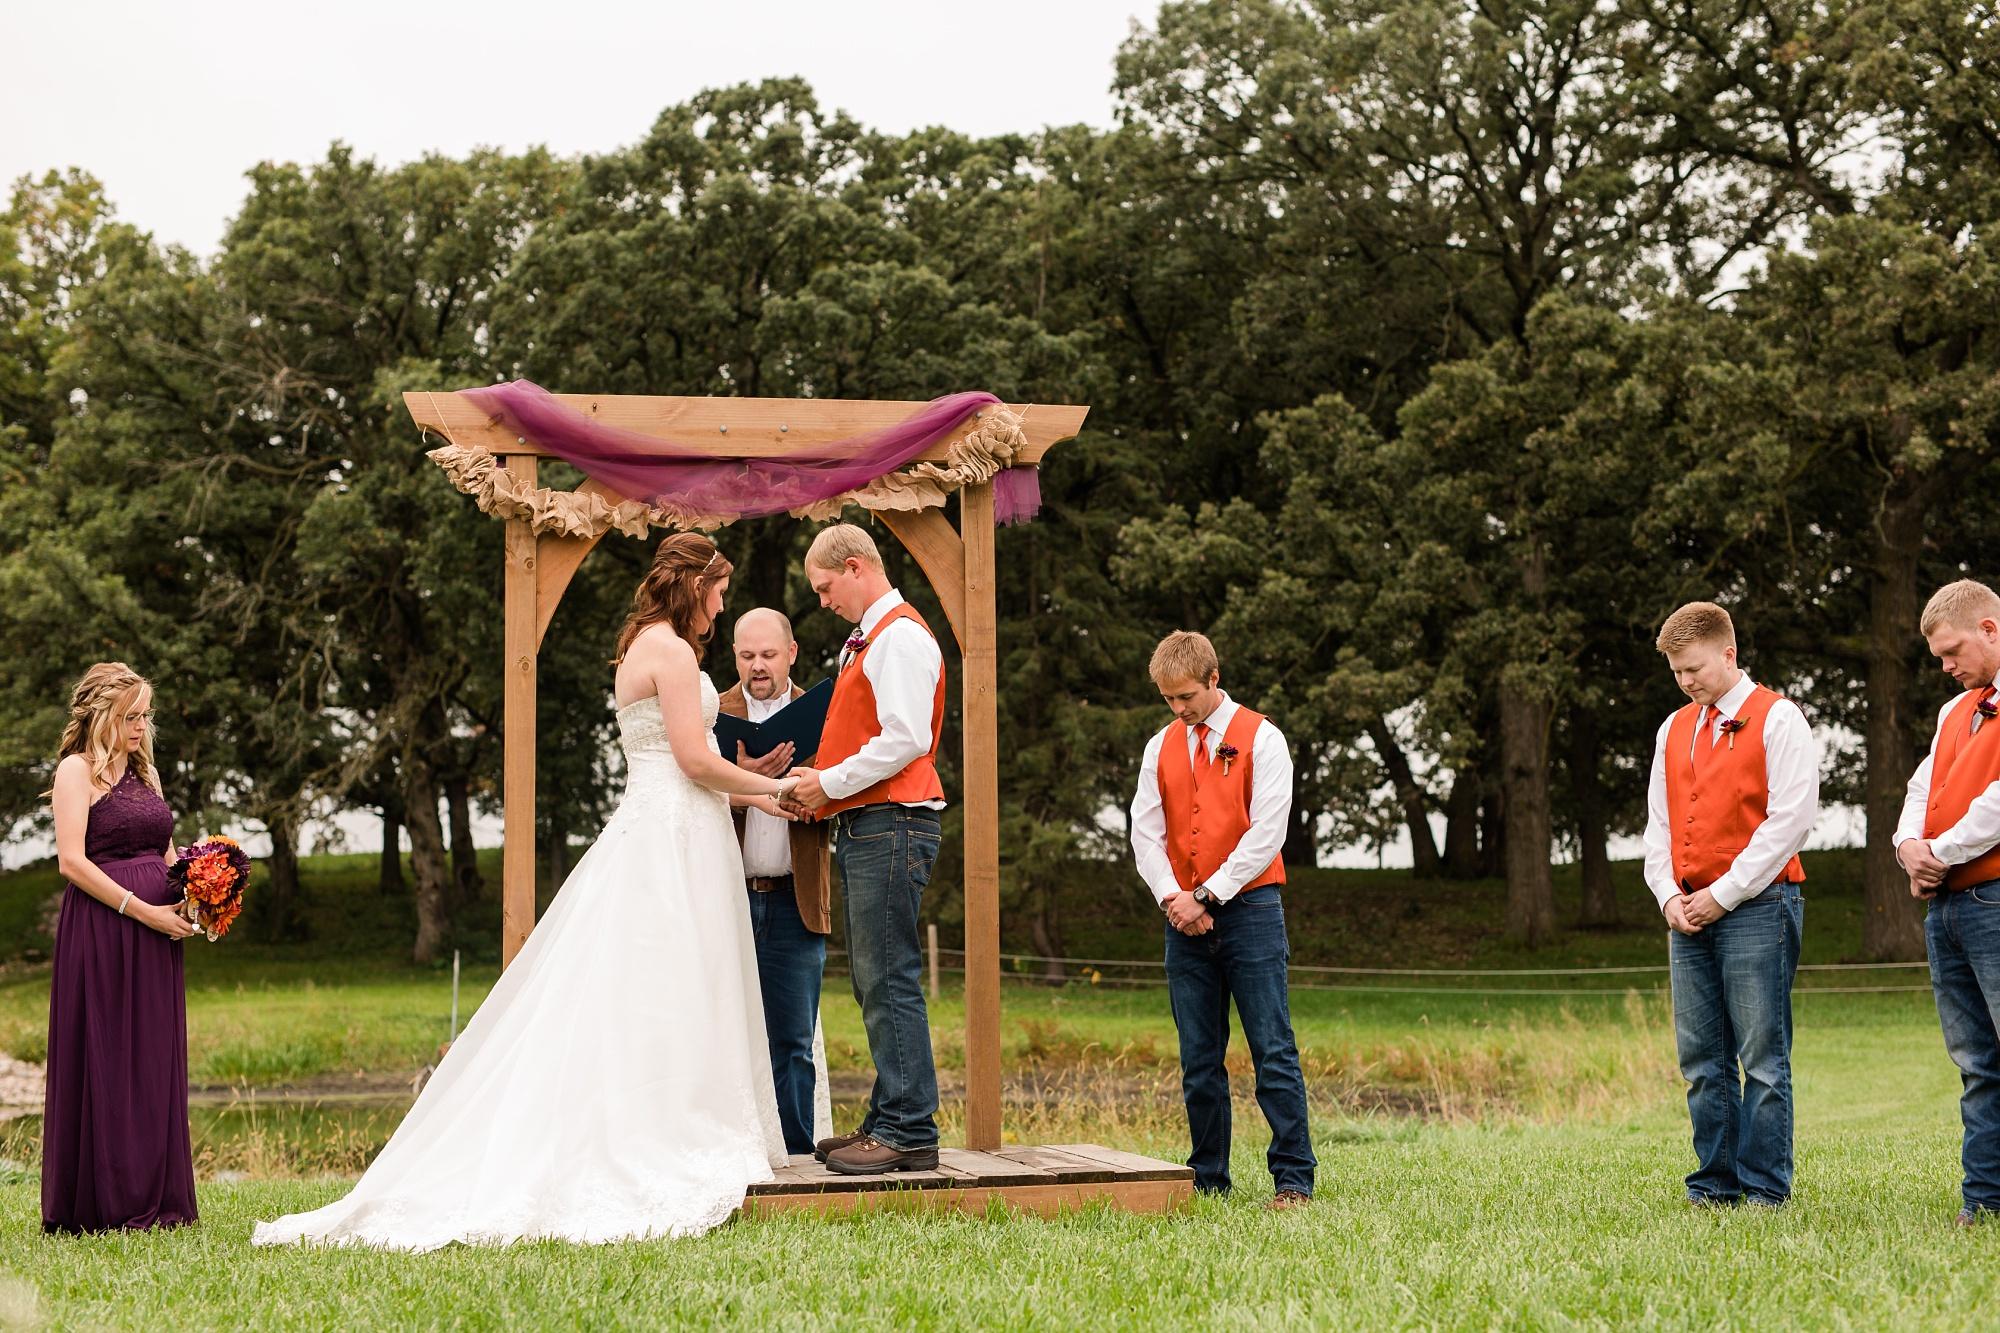 Amber Langerud_Lake Park MN Barn wedding at the Hitching Post_0448.jpg